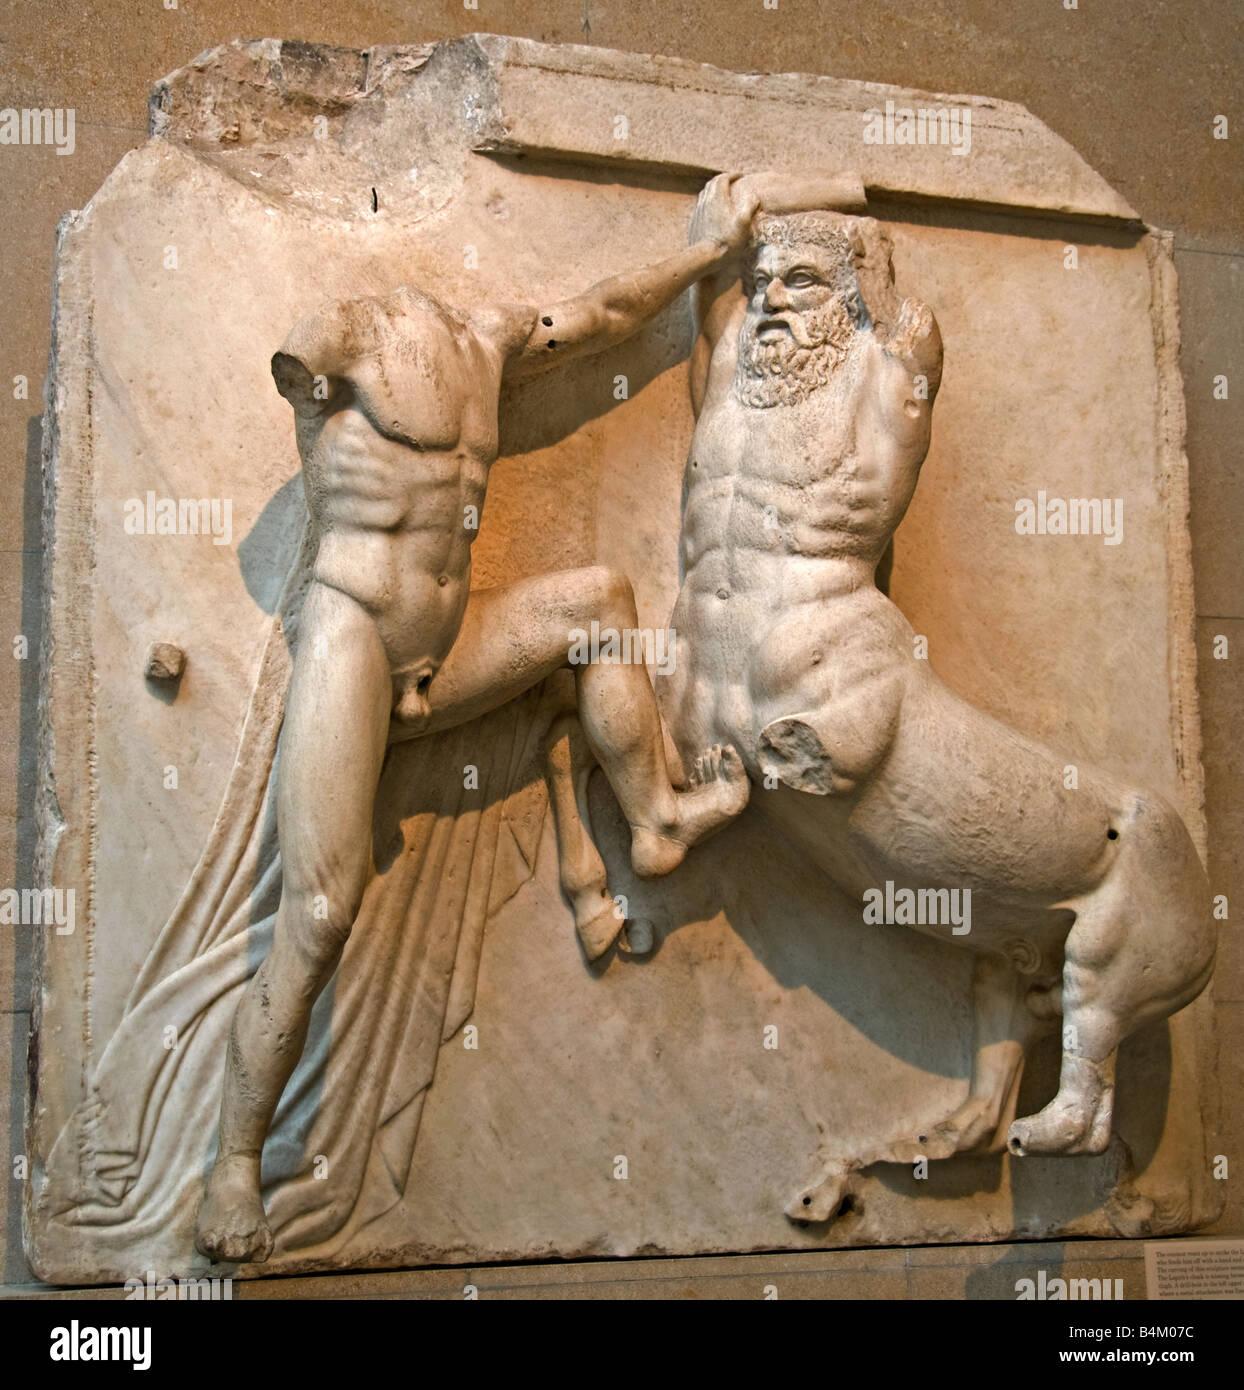 Centaur Panther skin Lapith Parthenon Pediment Metopes Frieze Greek mythology Greece Elgin Marbles Acropolis Athens - Stock Image